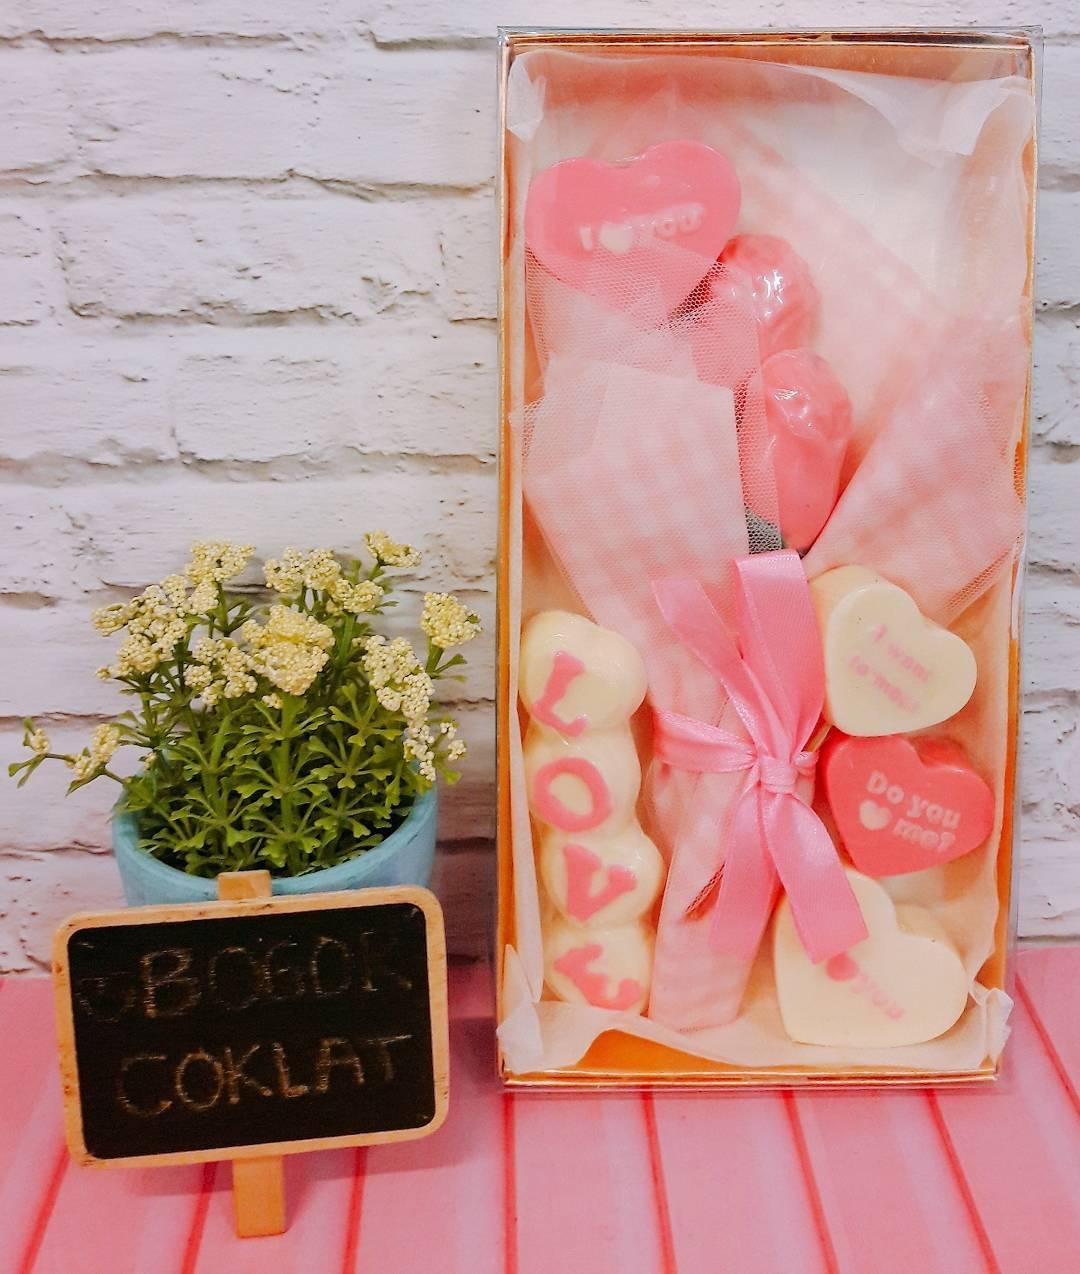 Gambar Buket Bunga Dan Coklat Gambar Bunga